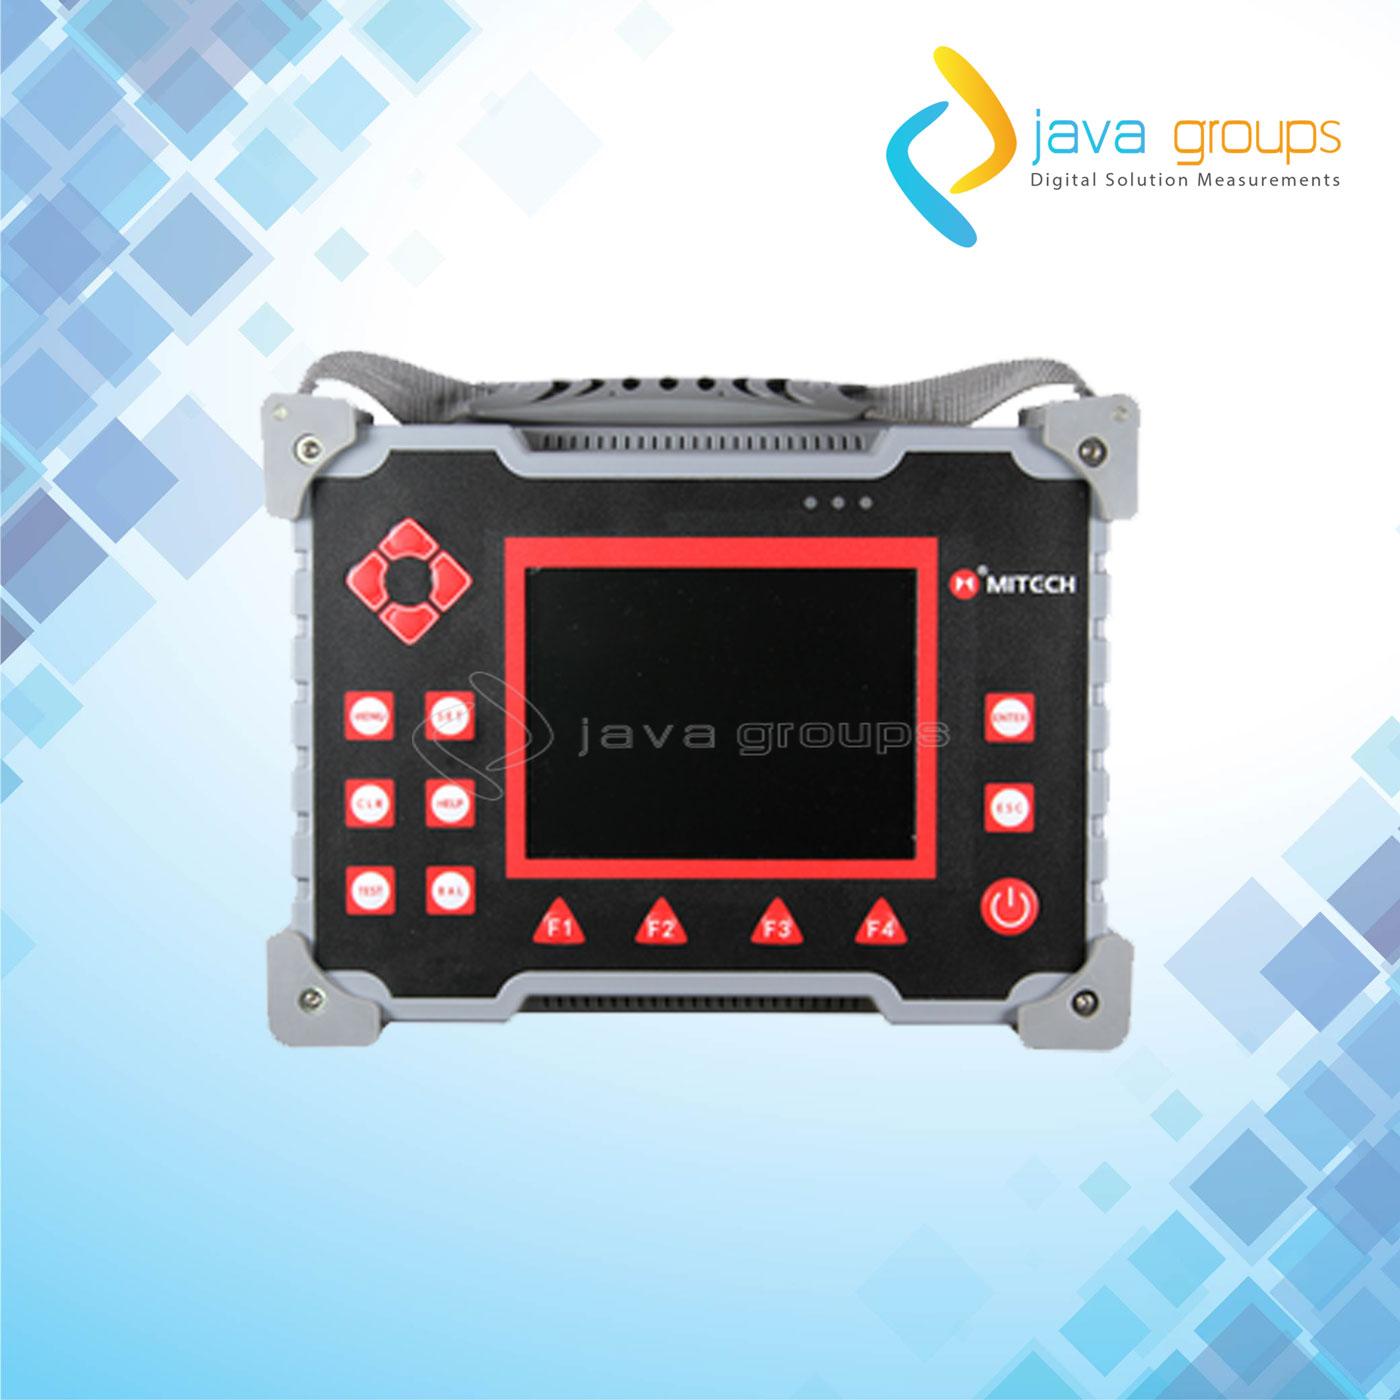 Alat Pengukur Digital Detektor Kecacatan Logam Mitech MET804